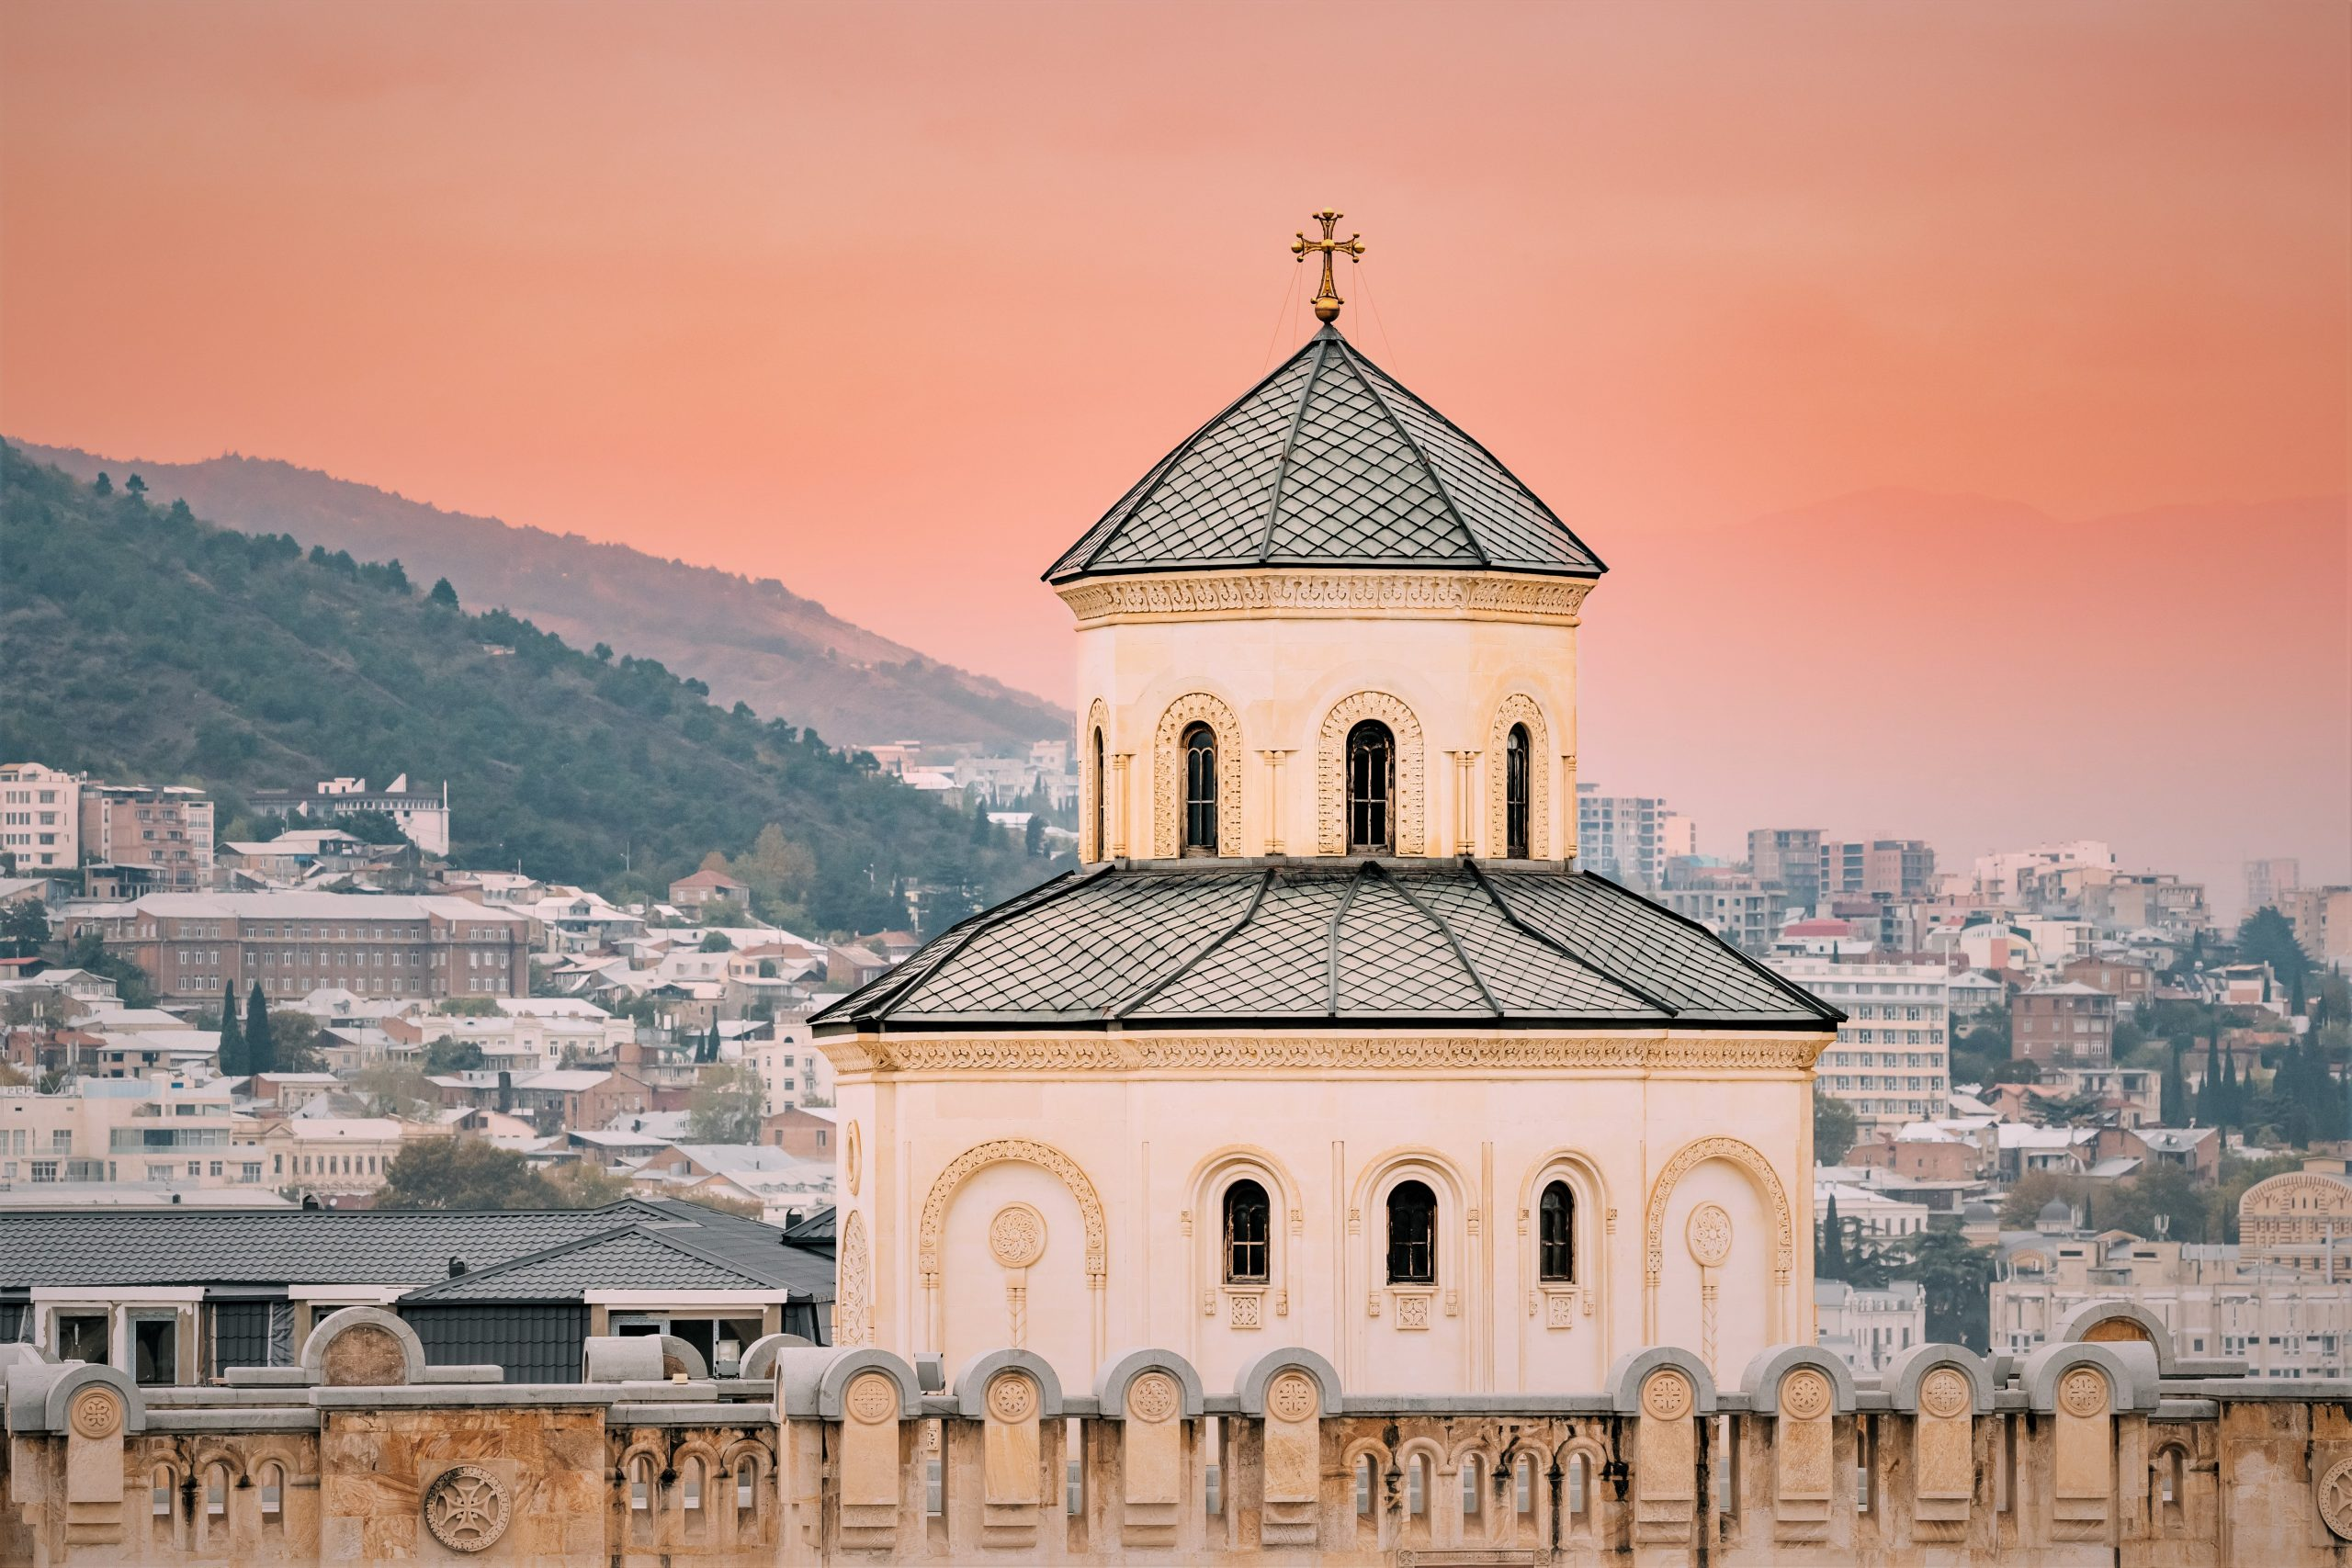 tbilisi georgia exterior of the holy trinity cathe CD32RY scaled #новости Грузинская Православная Церковь